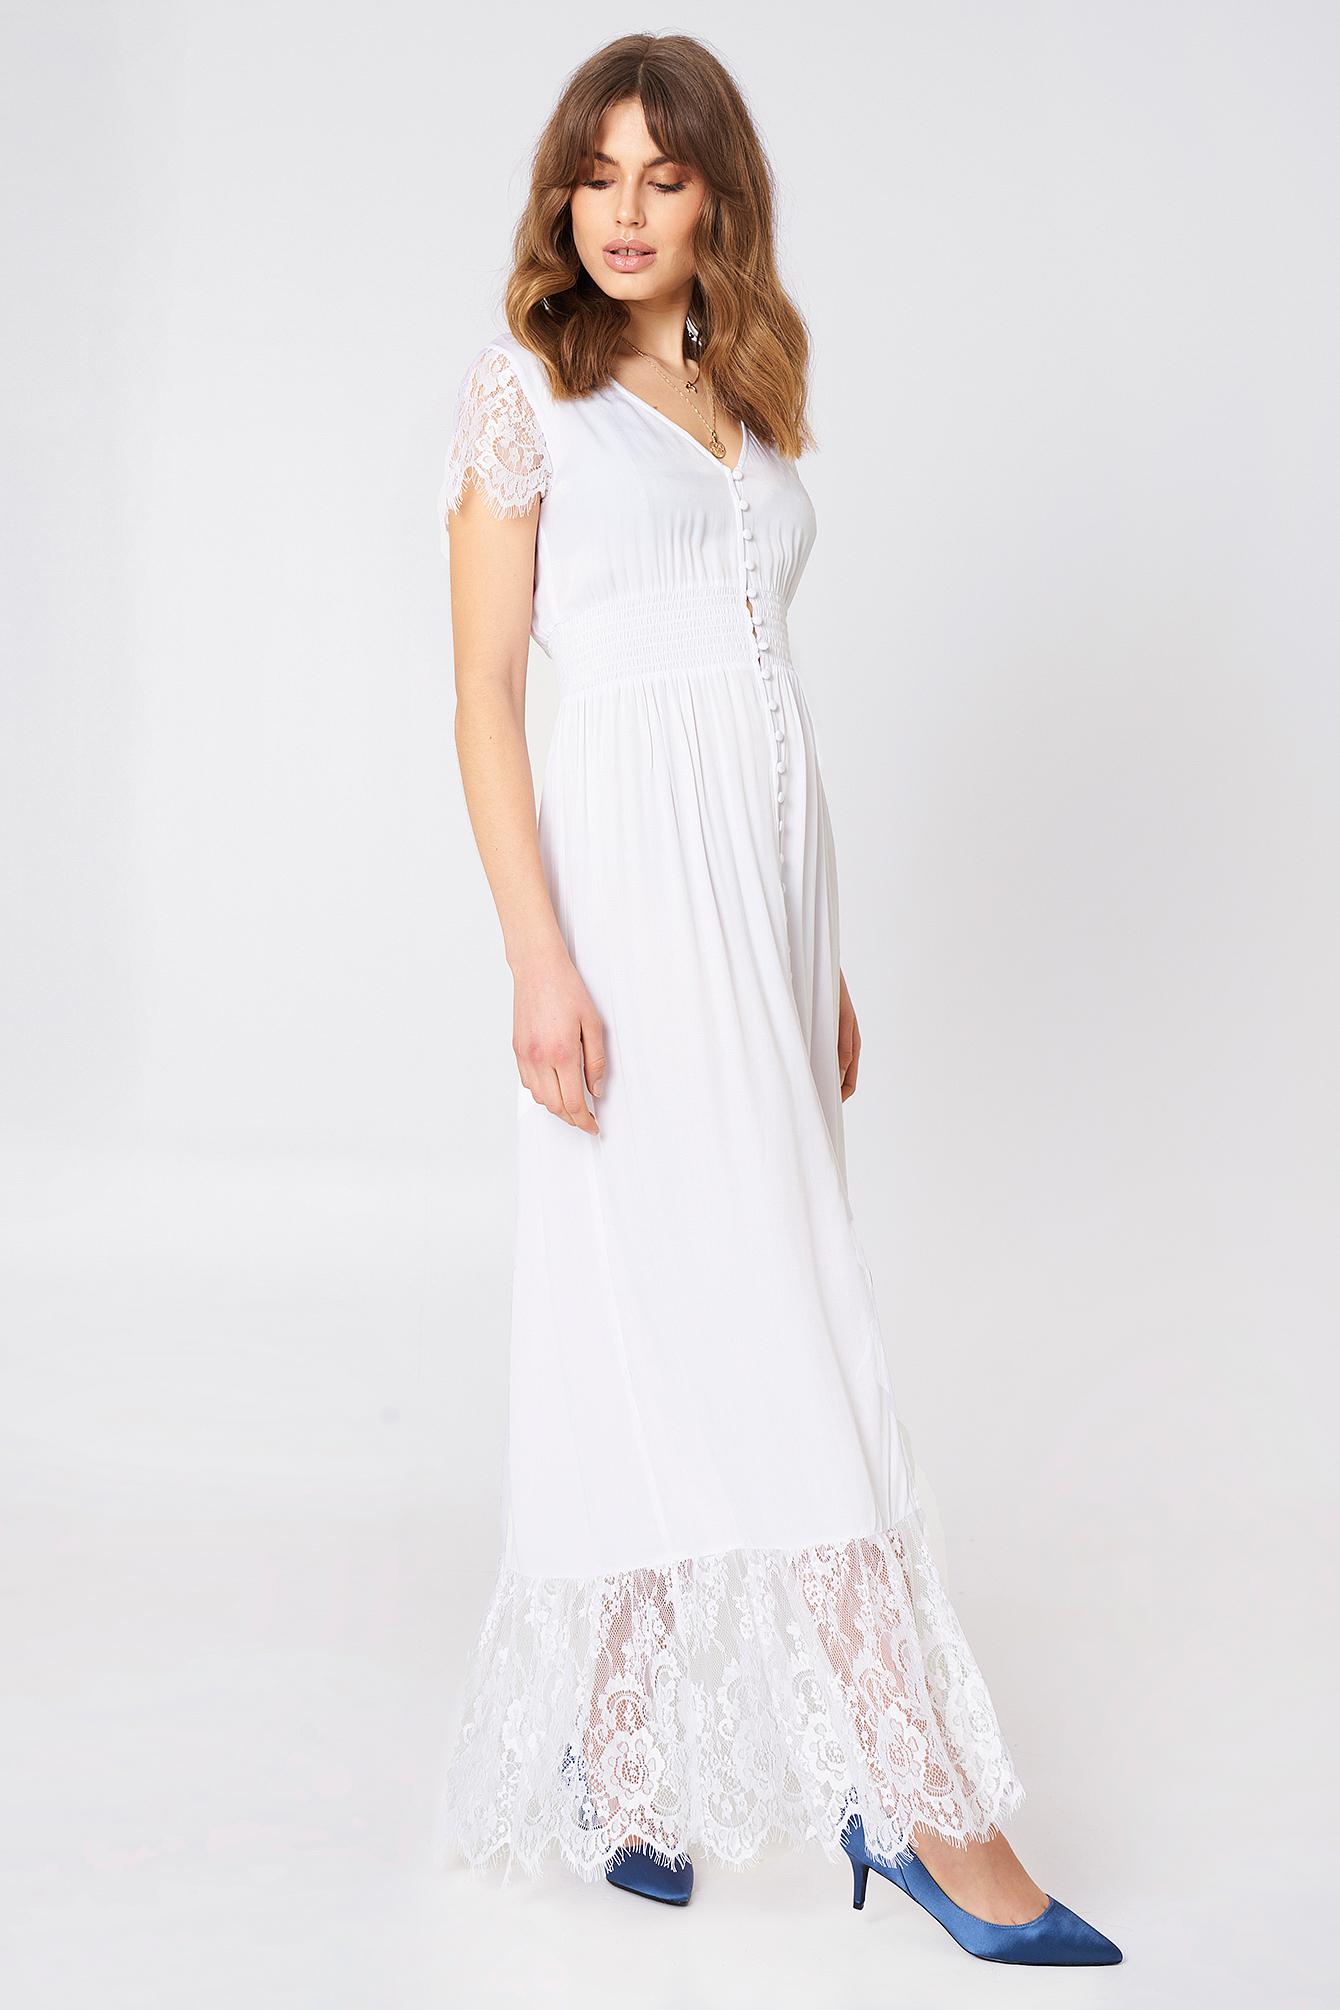 Ax paris black lace back layered prom dress